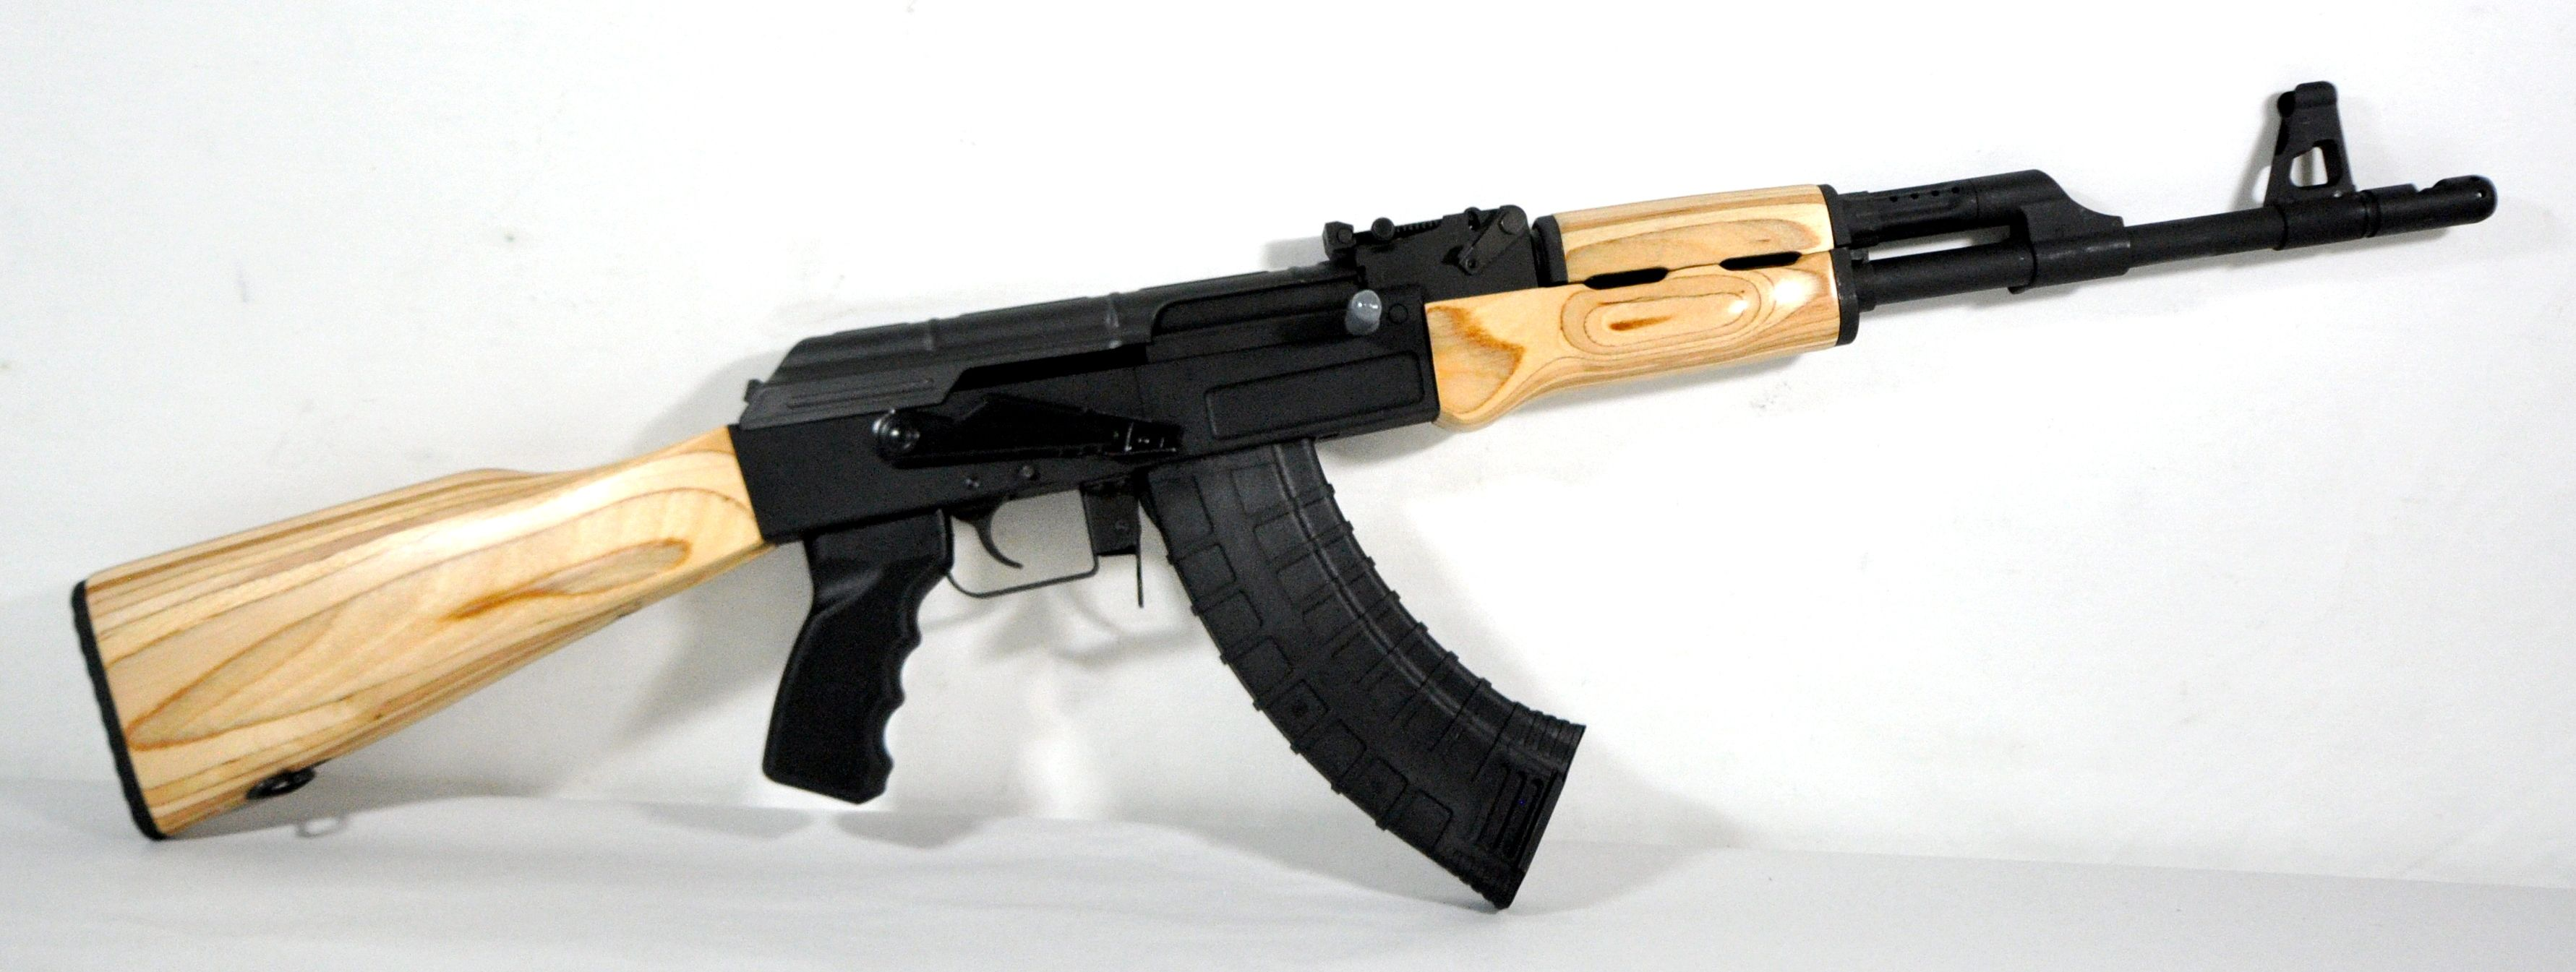 Cai Centurion C39 Blonde Laminated Wood 7 62x39 New In Box Blonde Laminate Blonde Wood Wood Laminate